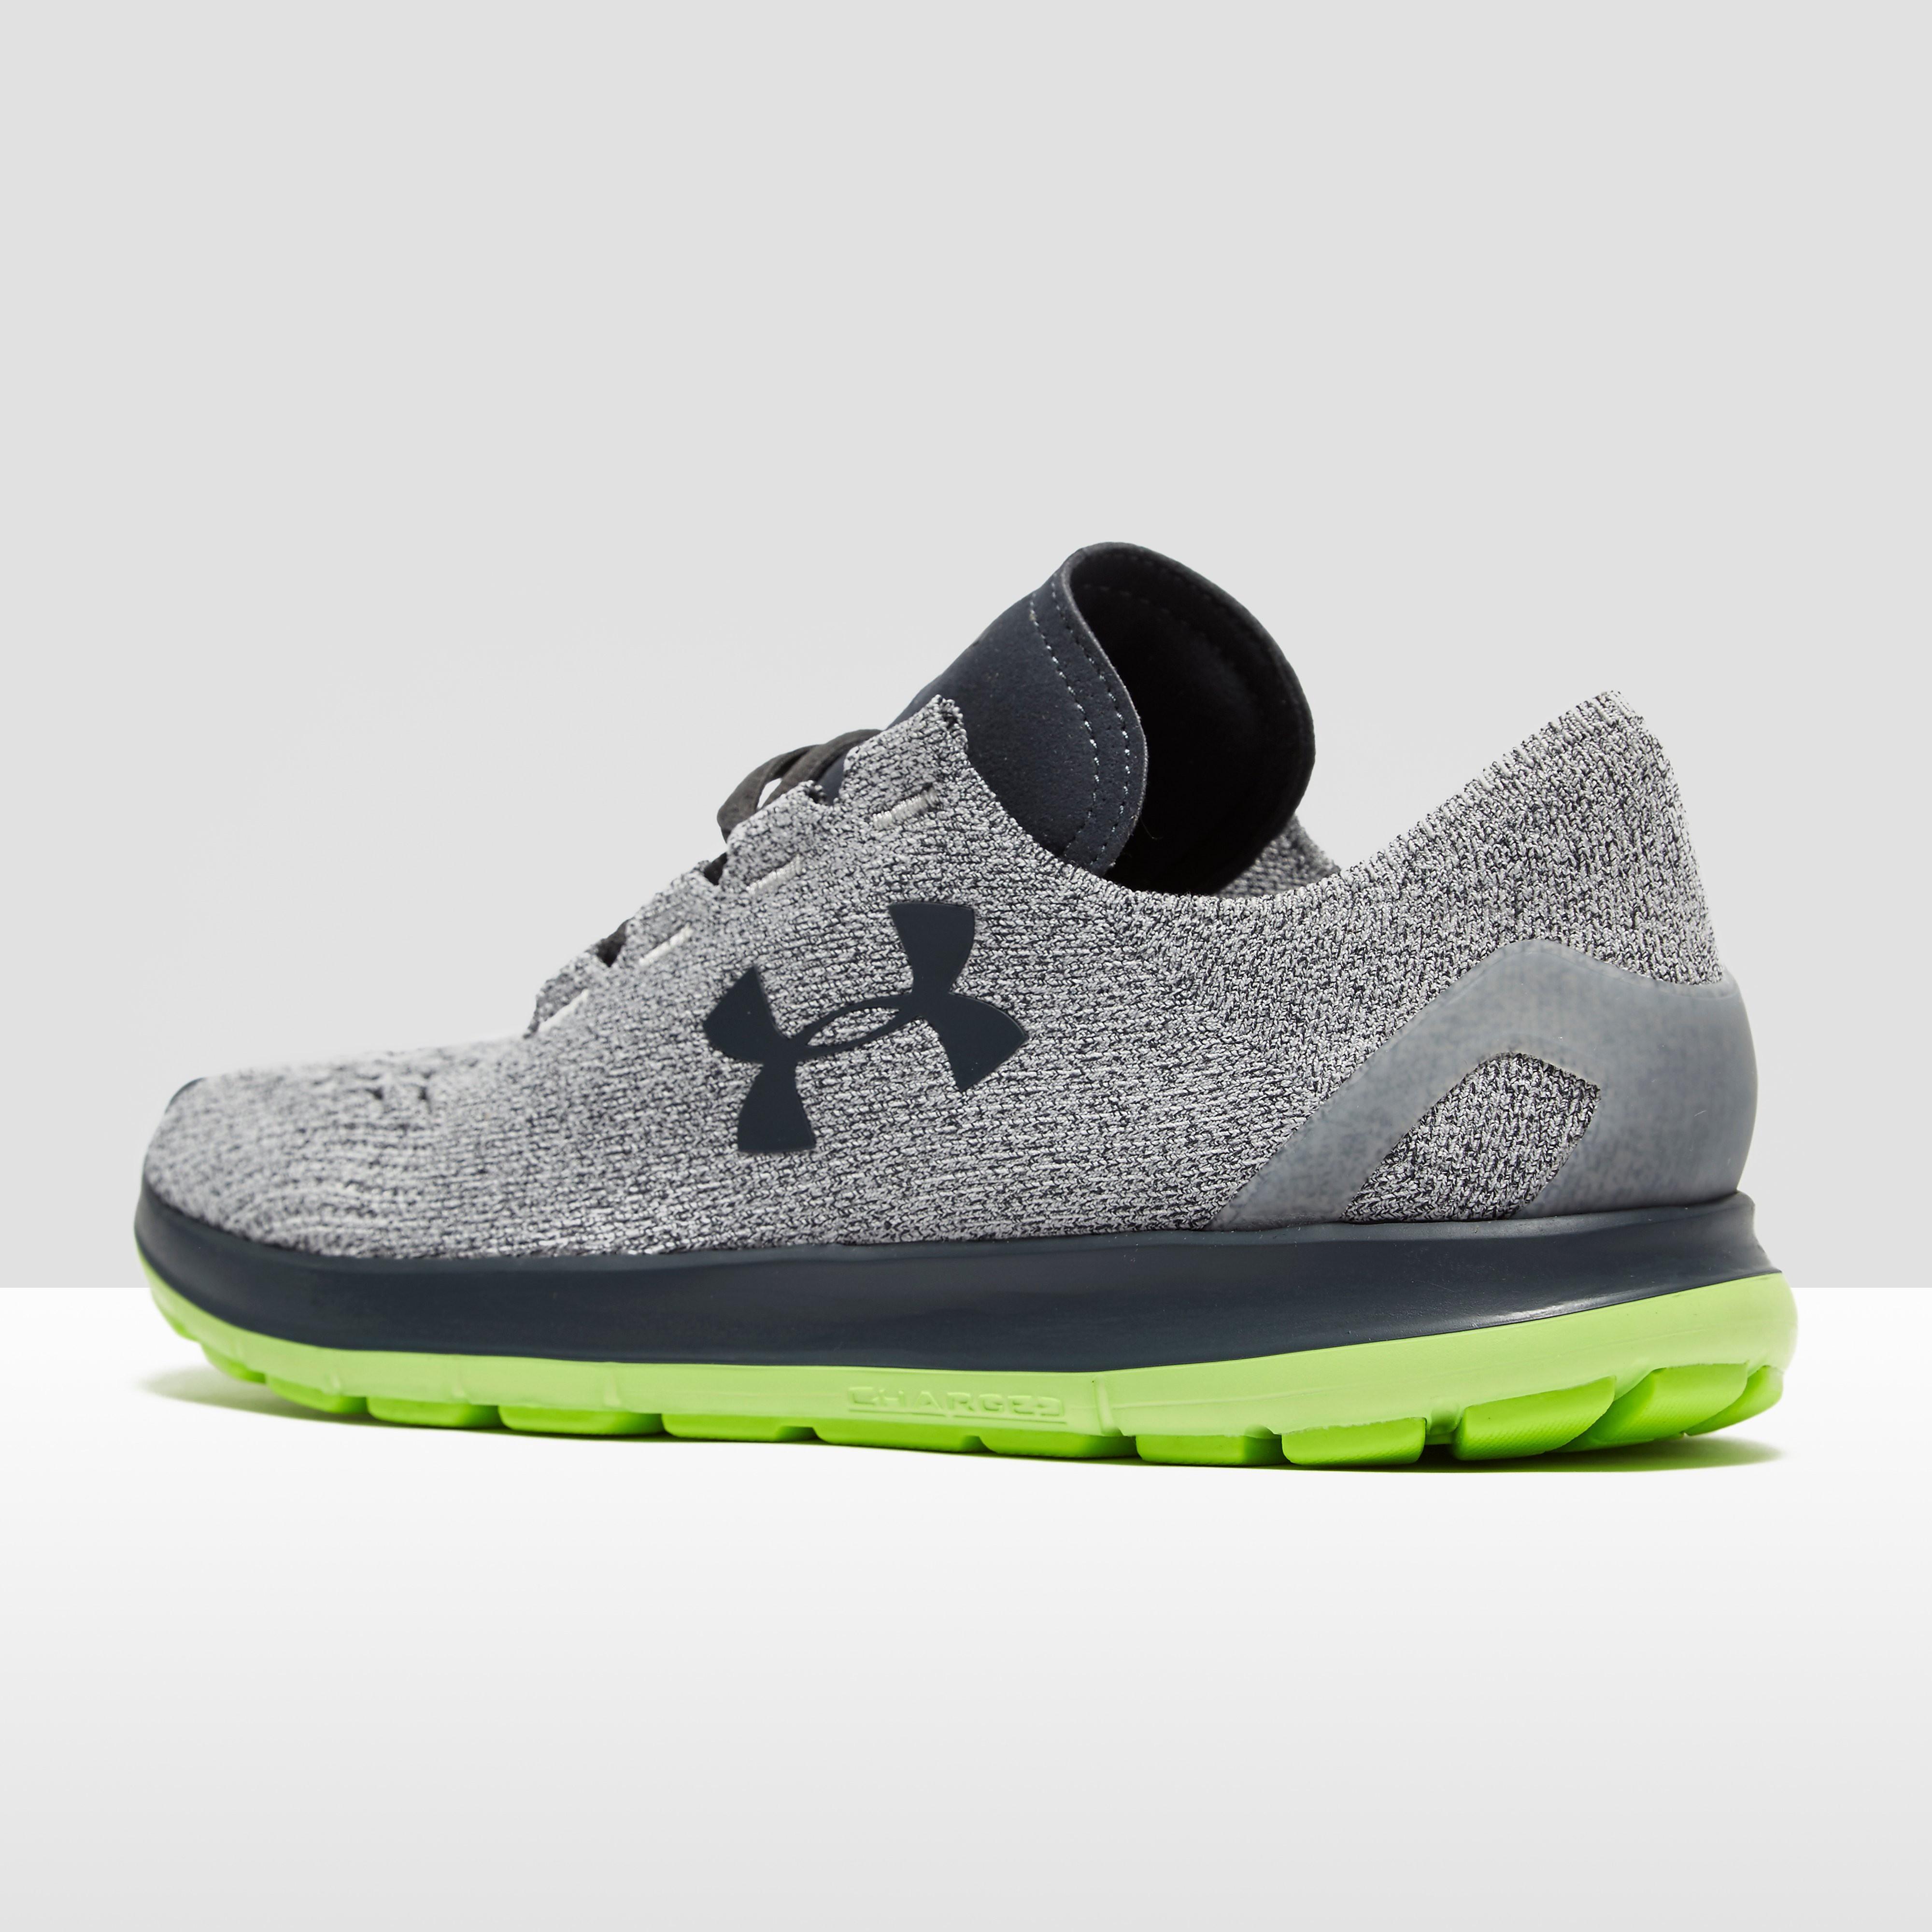 Under Armour Men's SpeedForm Slingride Running Shoes